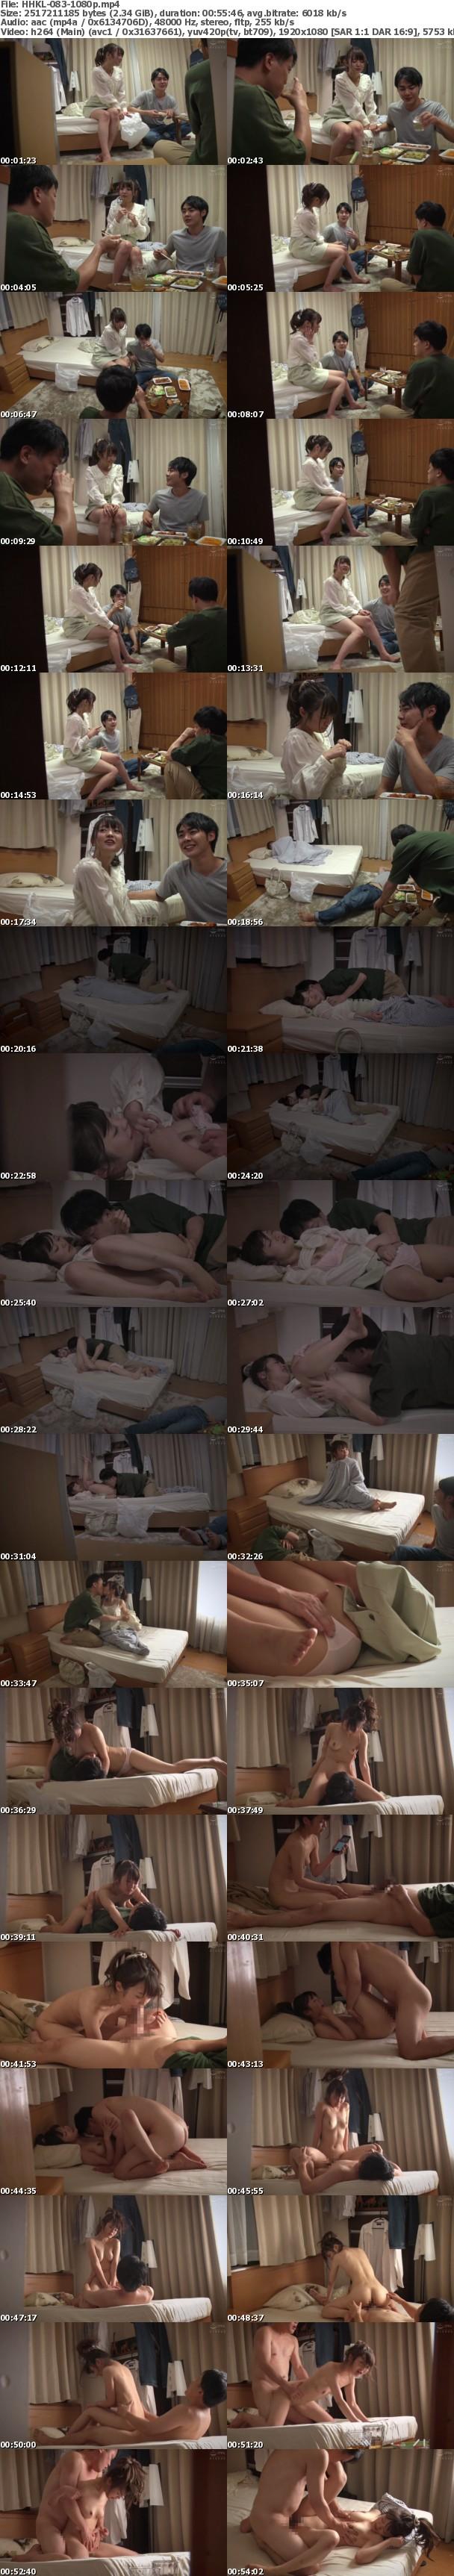 (Full HD) HHKL-083 宅飲み後の雑魚寝状態の部屋で気になるあの子に夜●いを仕掛けた。 天沢ゆきね